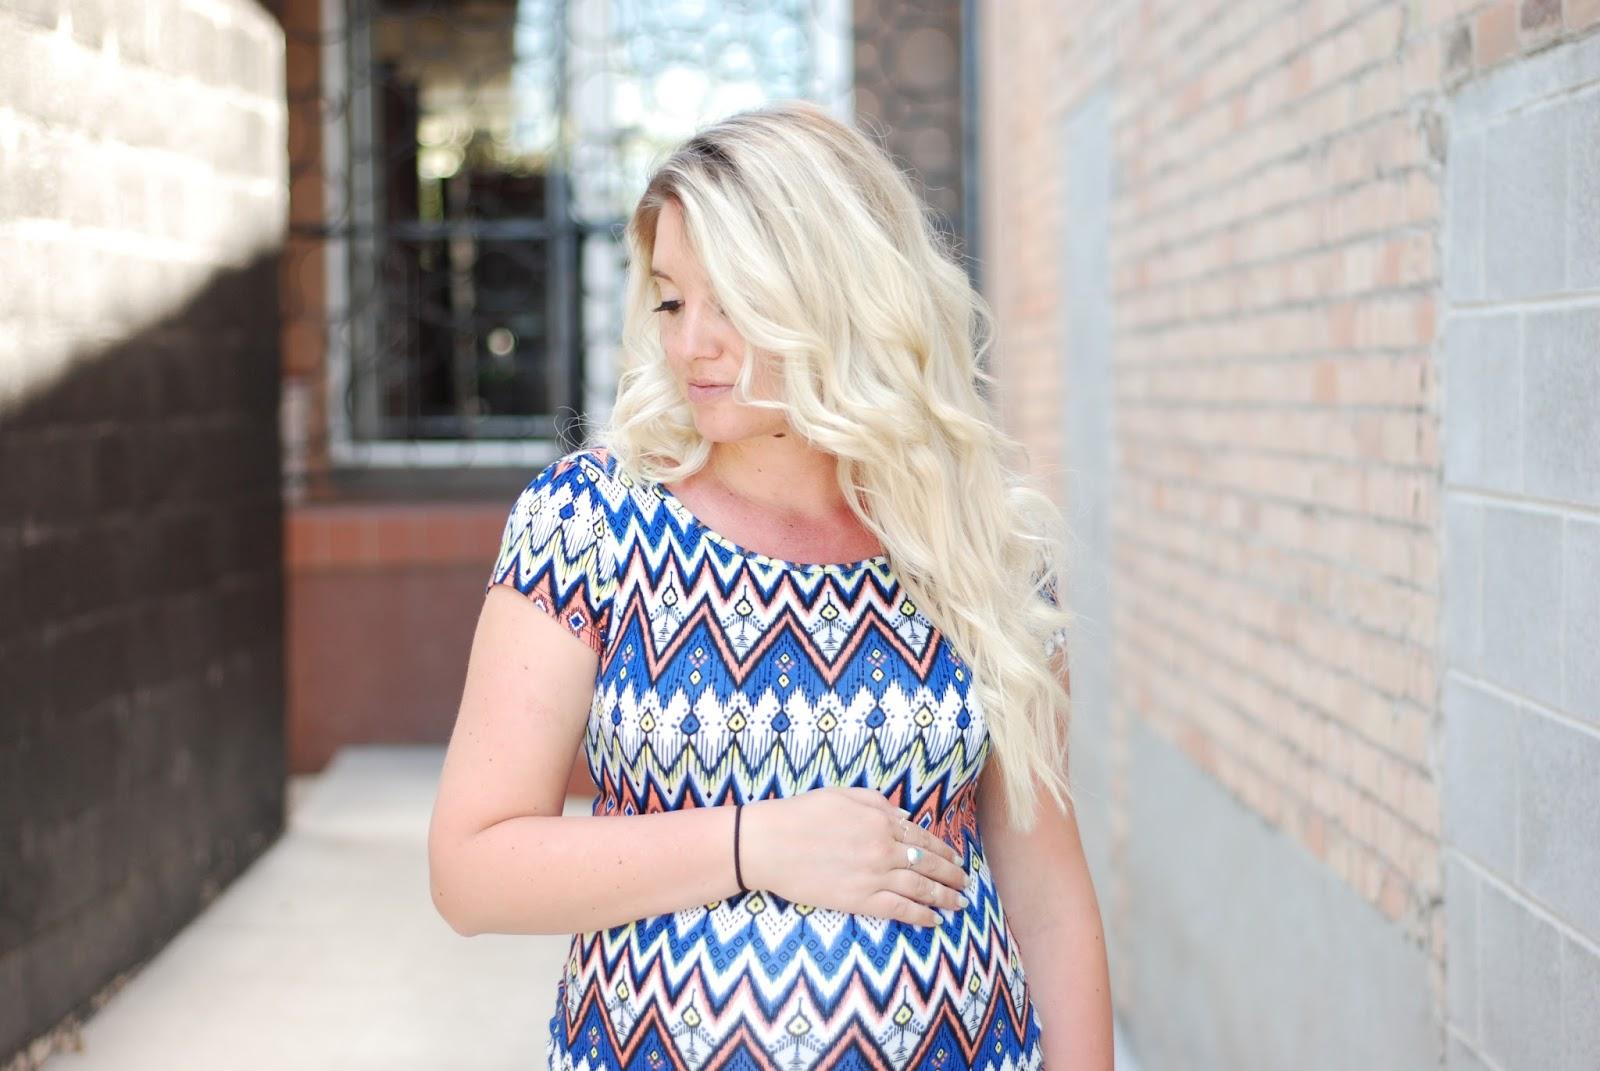 Long Blonde Hair, Printed Dress